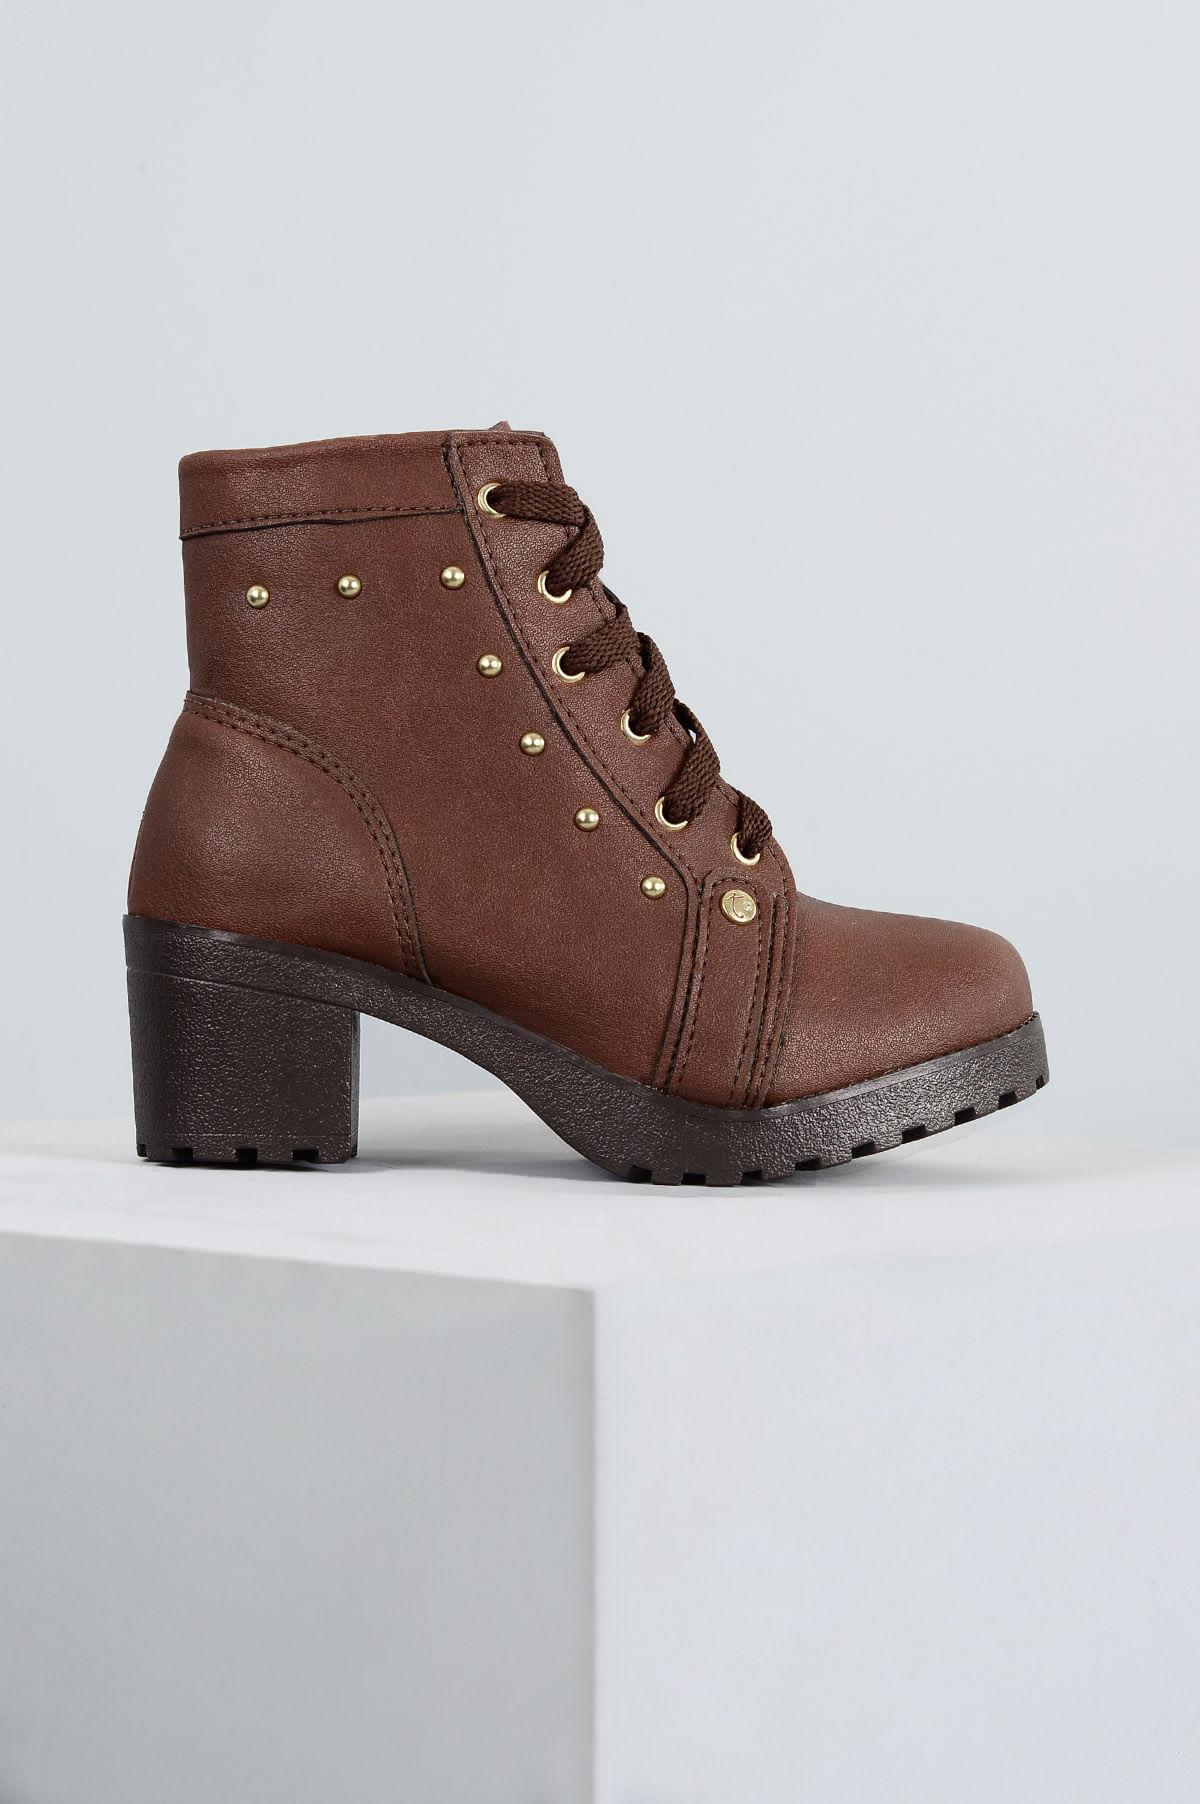 2f922080e Bota Infantil Klassipé Luly SINT - MARRON - Mundial Calçados